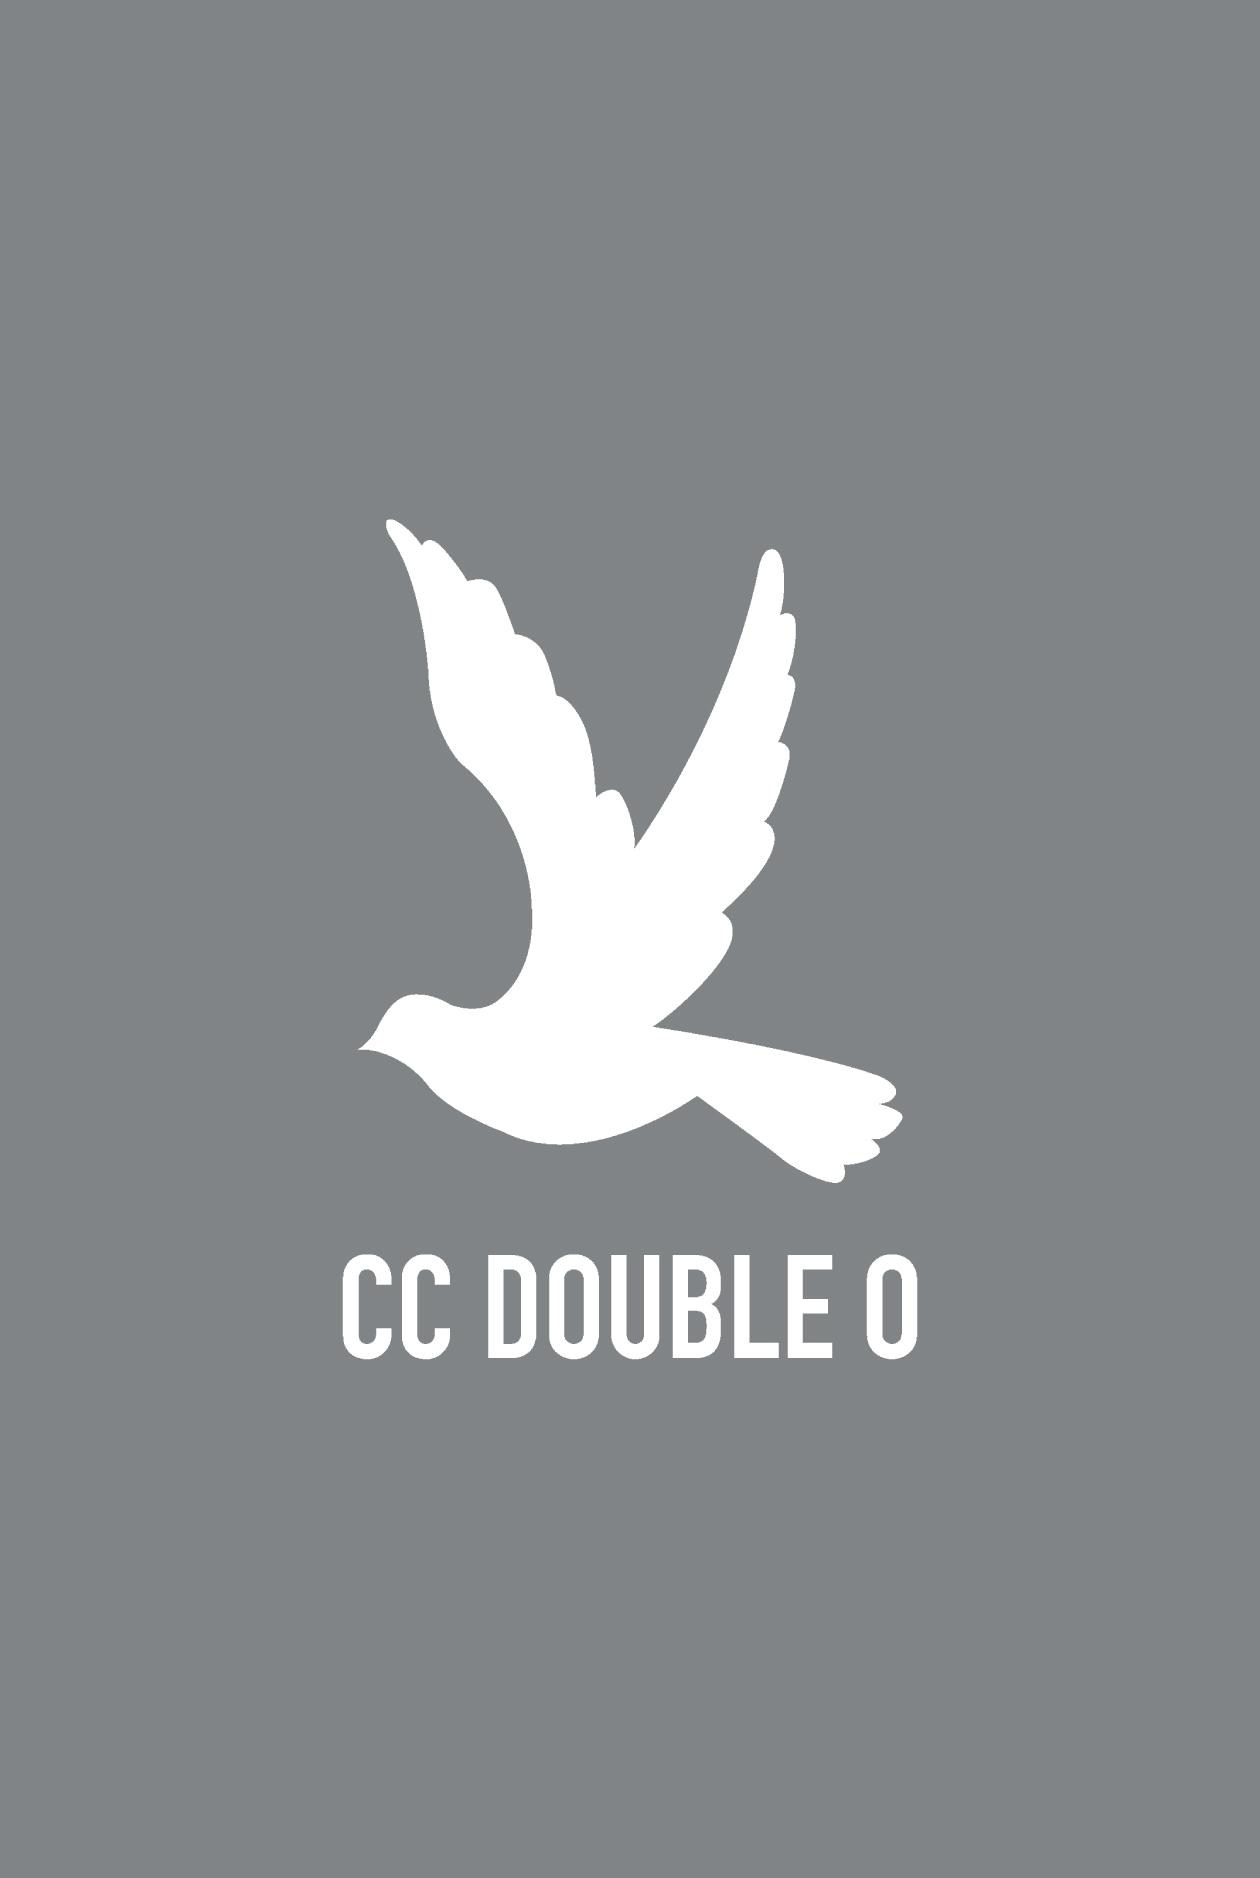 Bird Logo Hoodie Jacket